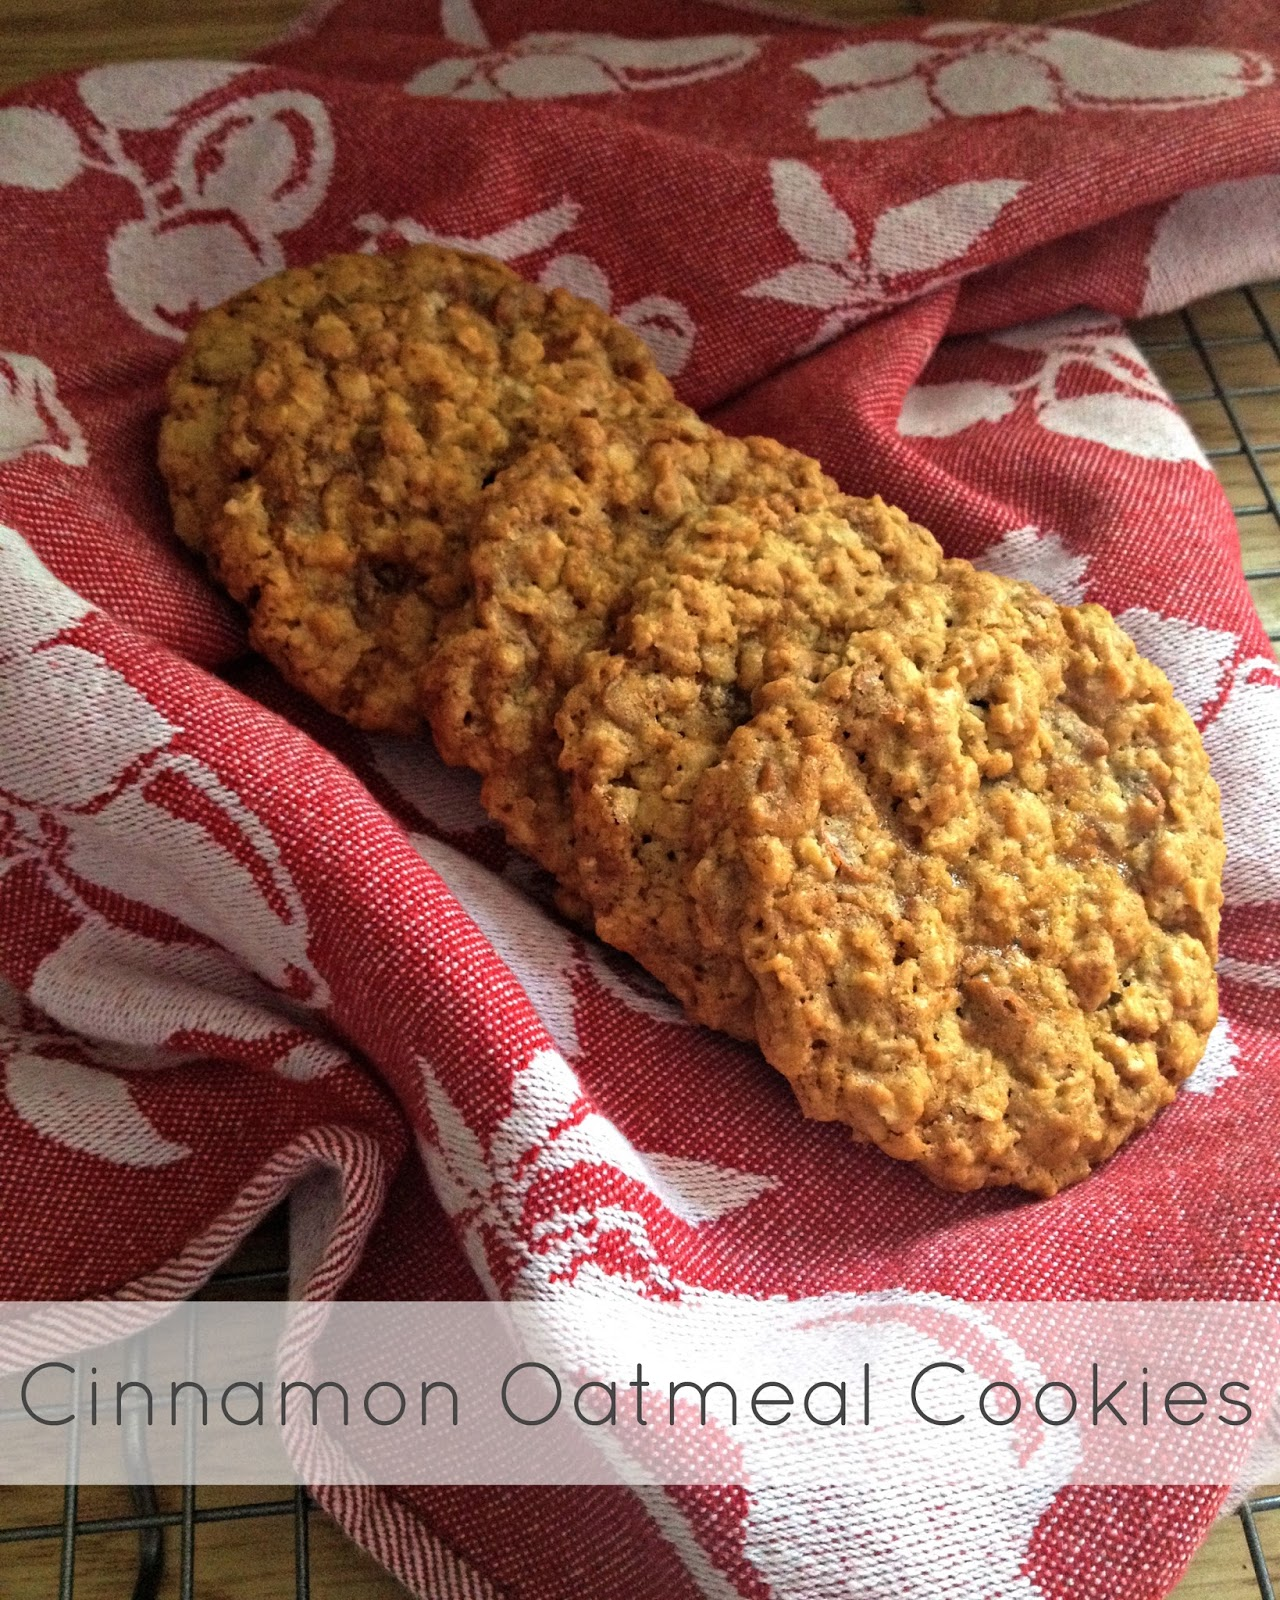 Sunflour Cottage Creations: Cinnamon Oatmeal Cookies